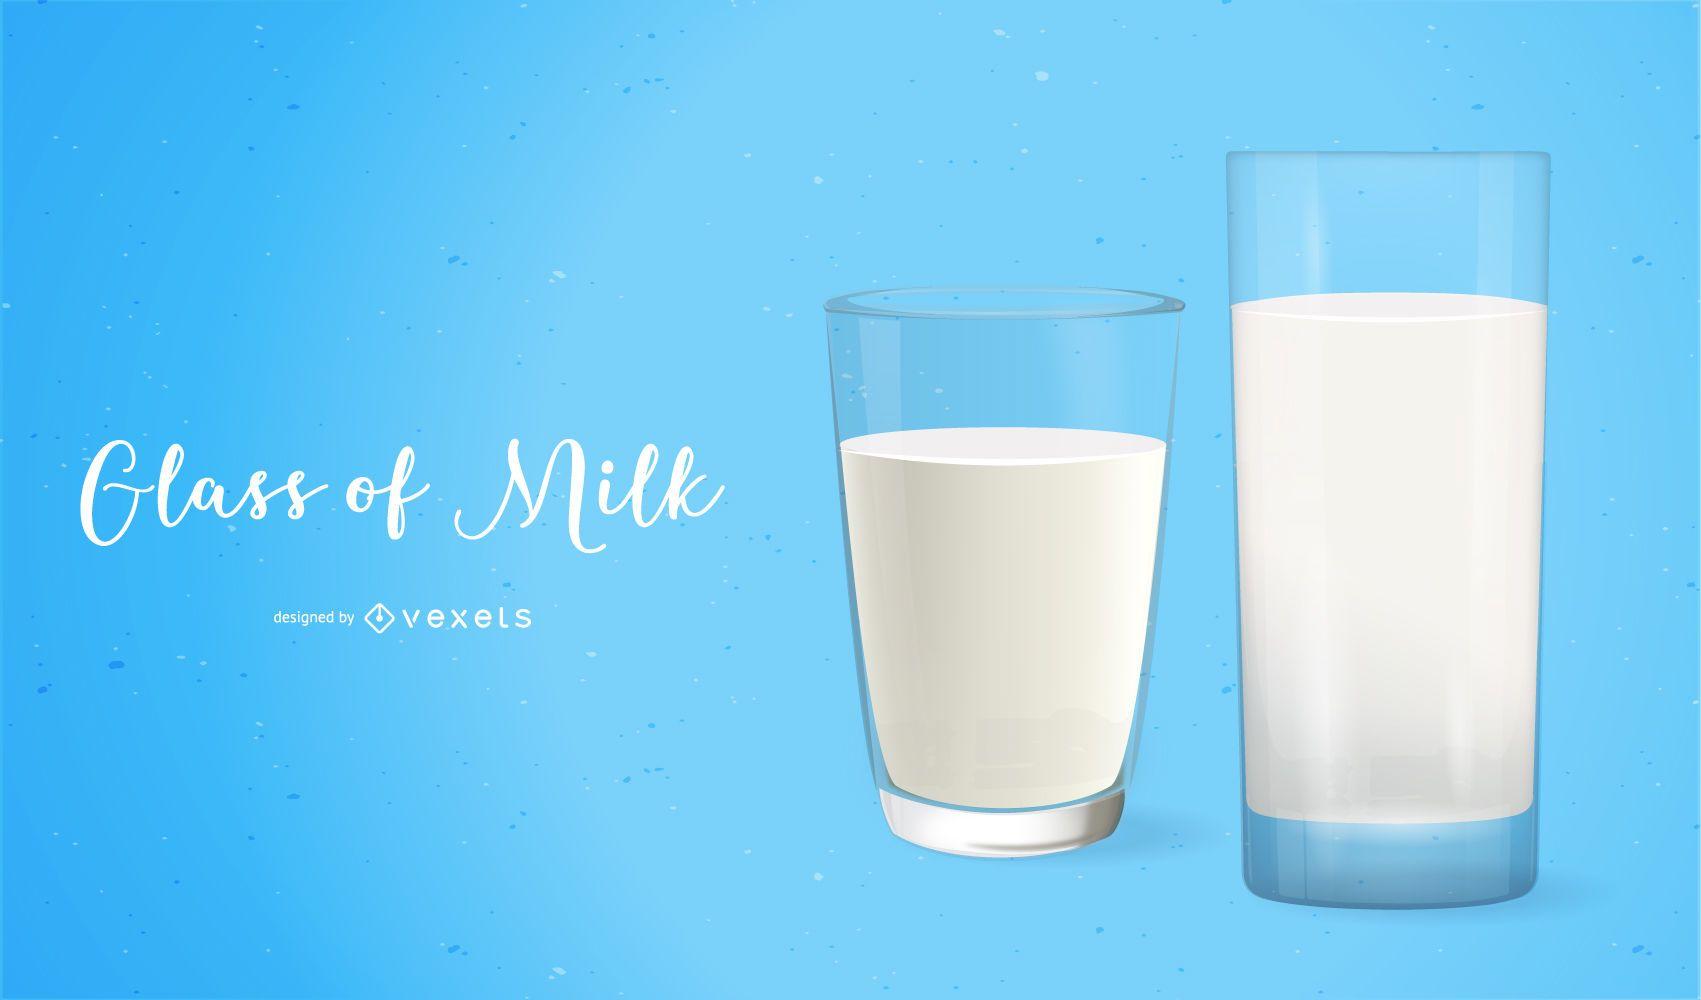 Hyper Real Glass of Milk